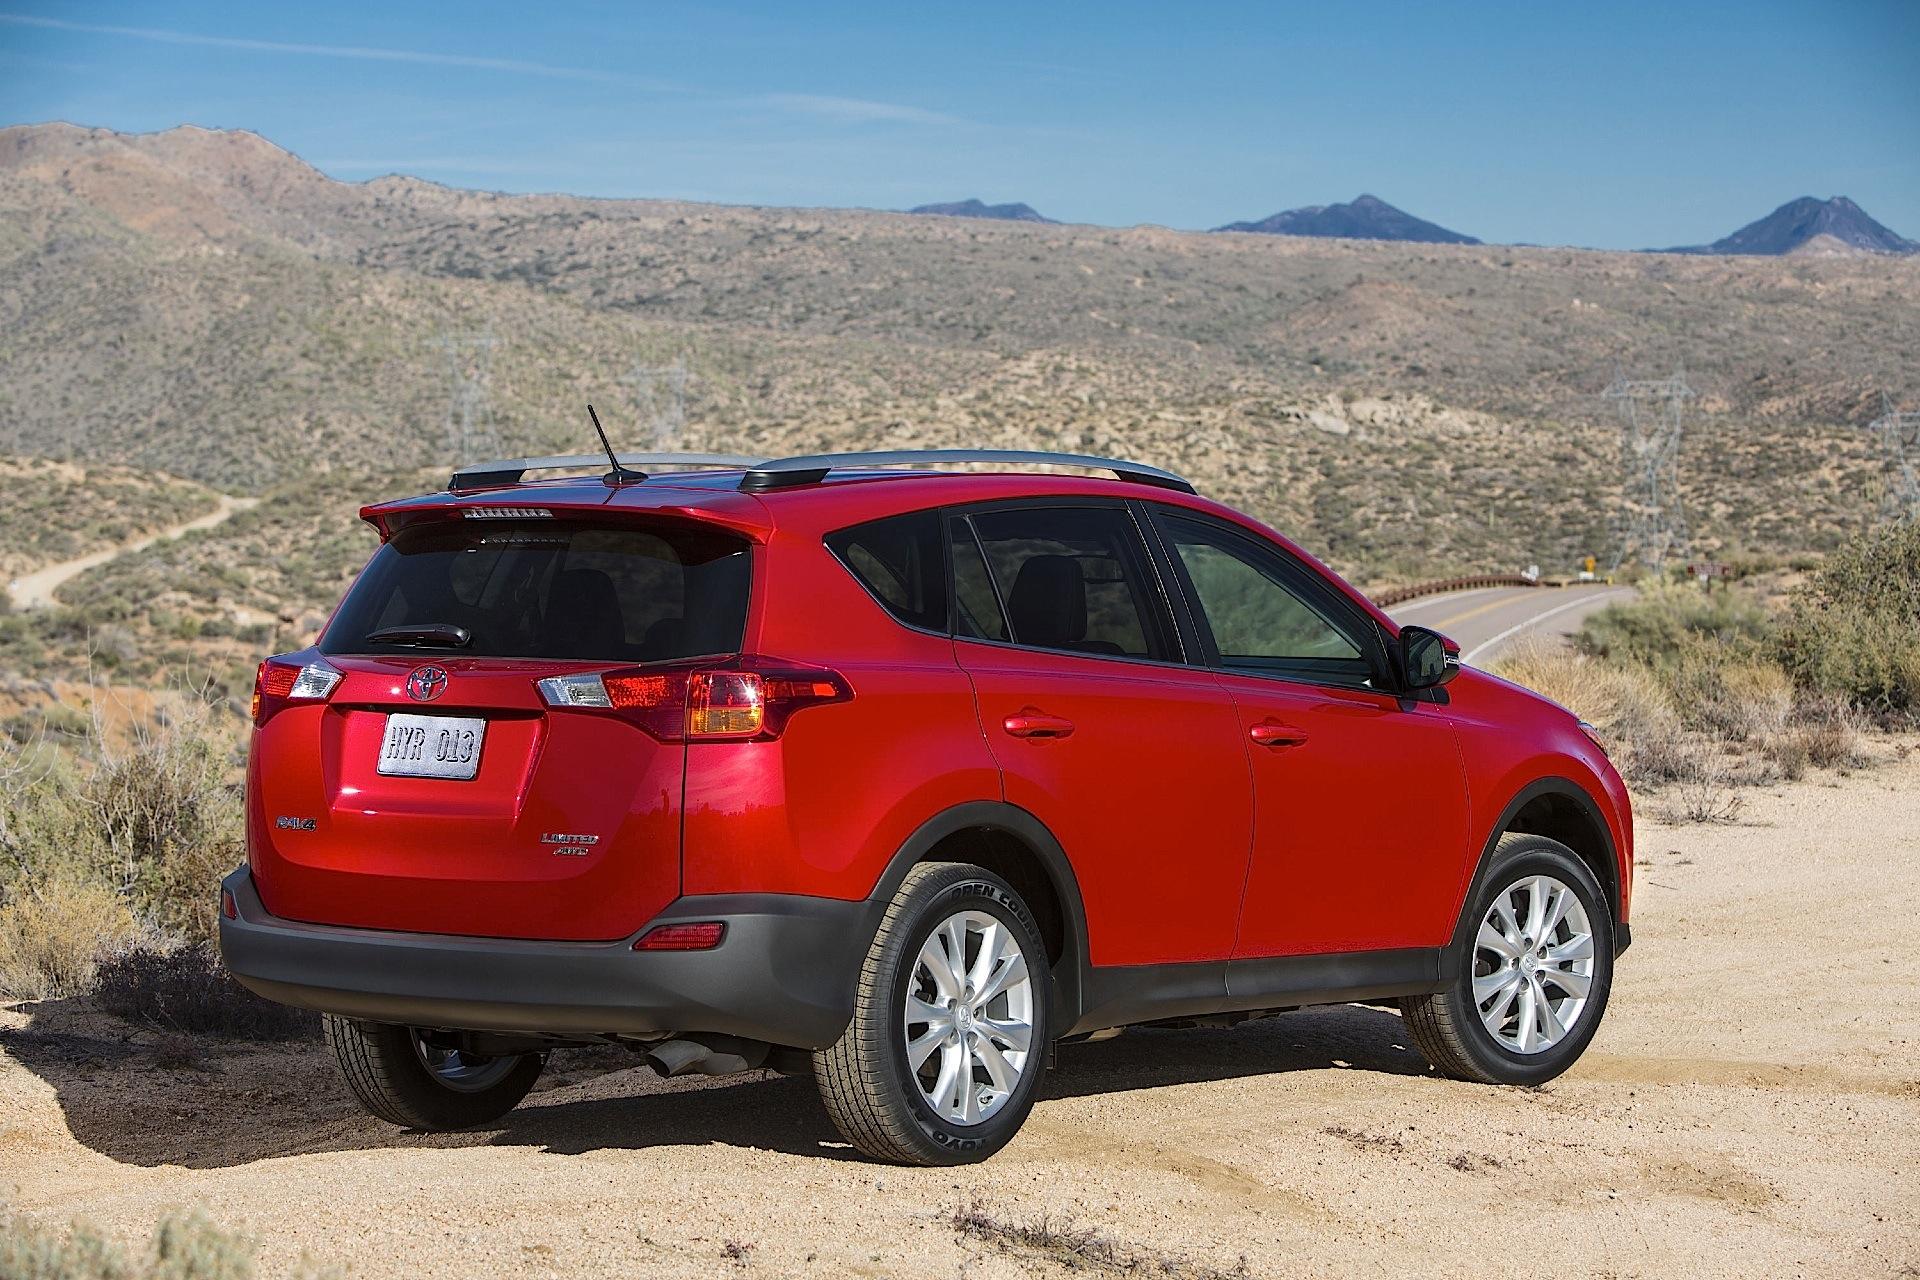 2015 Toyota Rav4 For Sale >> TOYOTA RAV4 5 Doors specs - 2013, 2014, 2015 - autoevolution